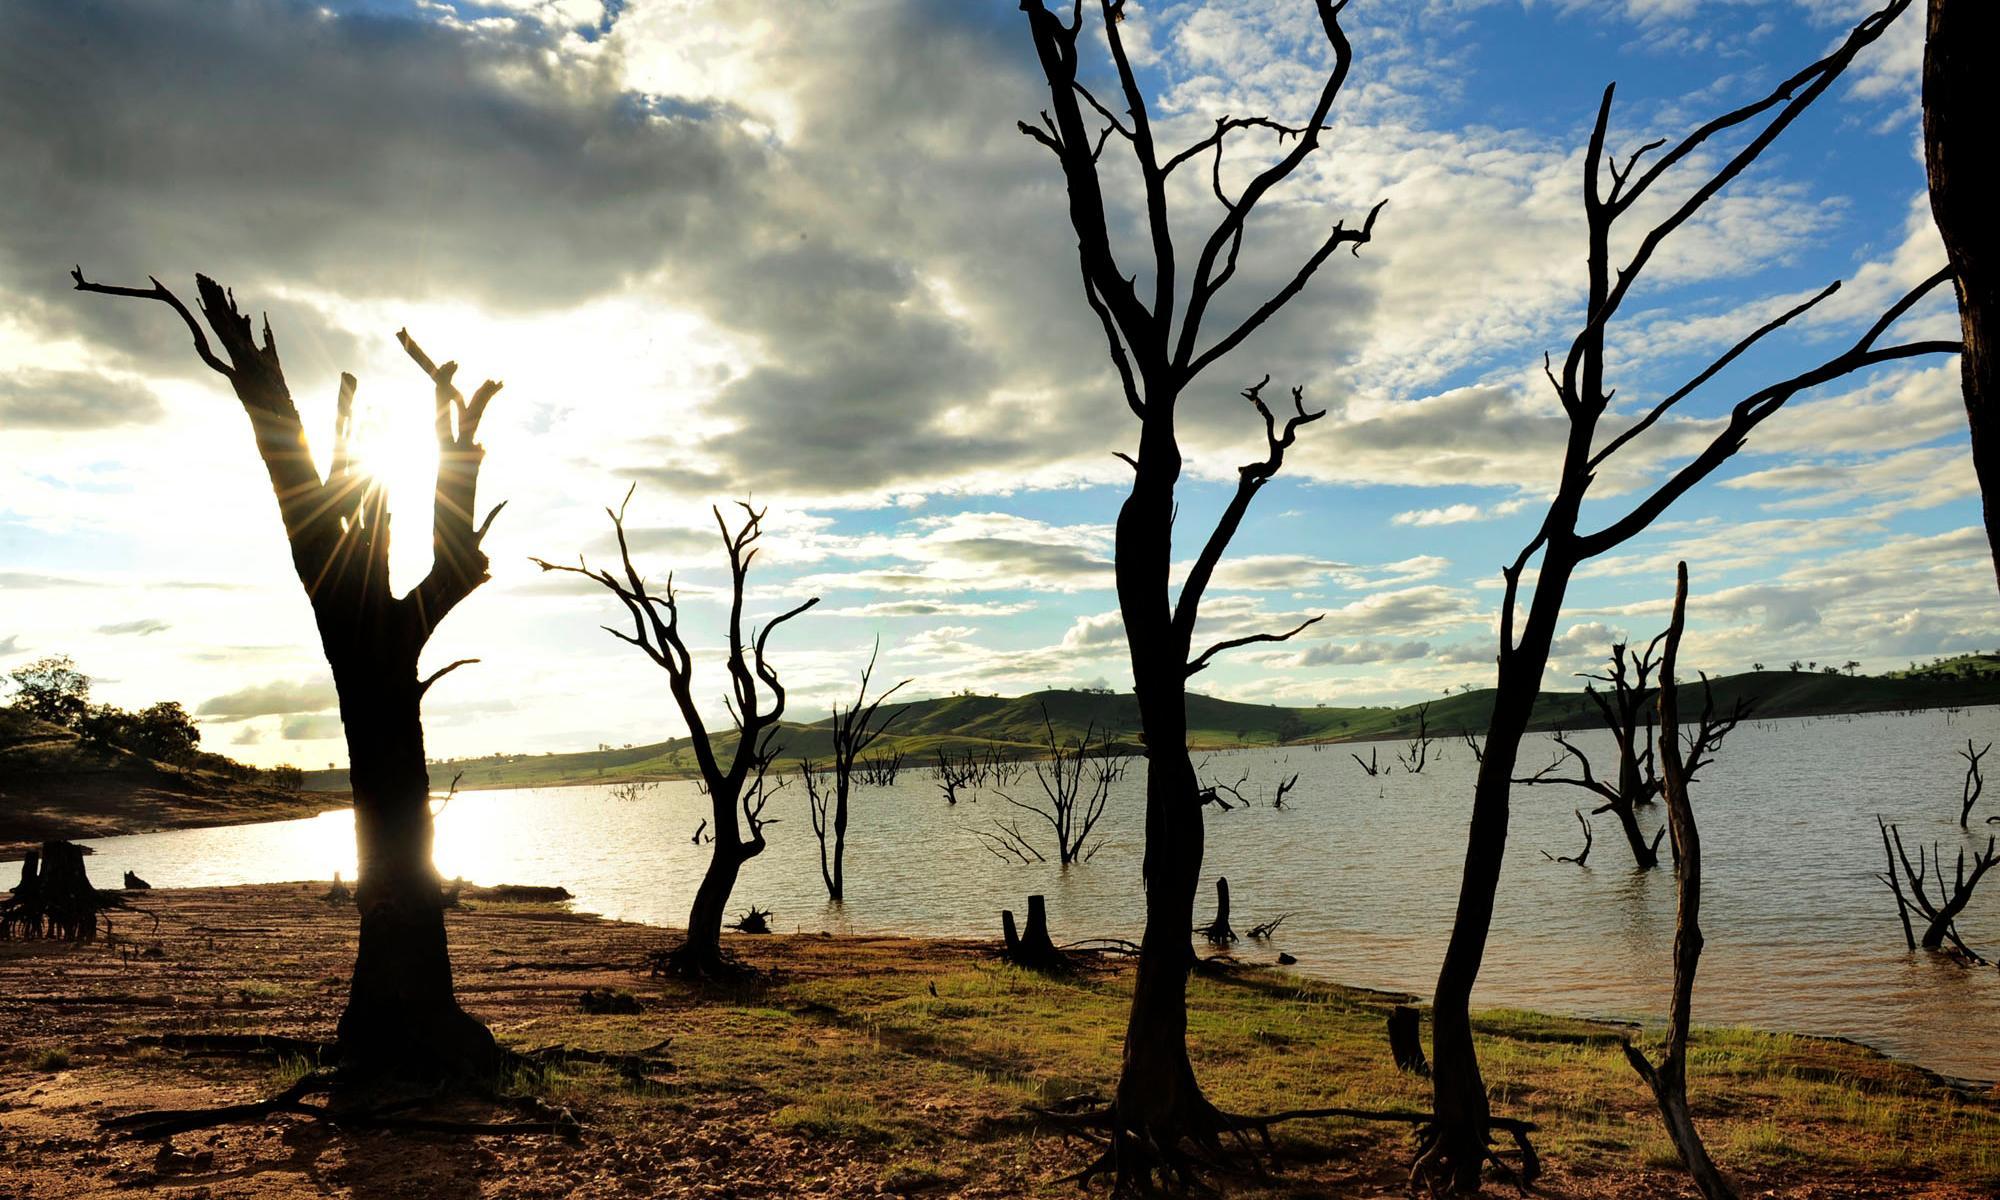 Met Office warns of global temperature rise exceeding 1.5C limit